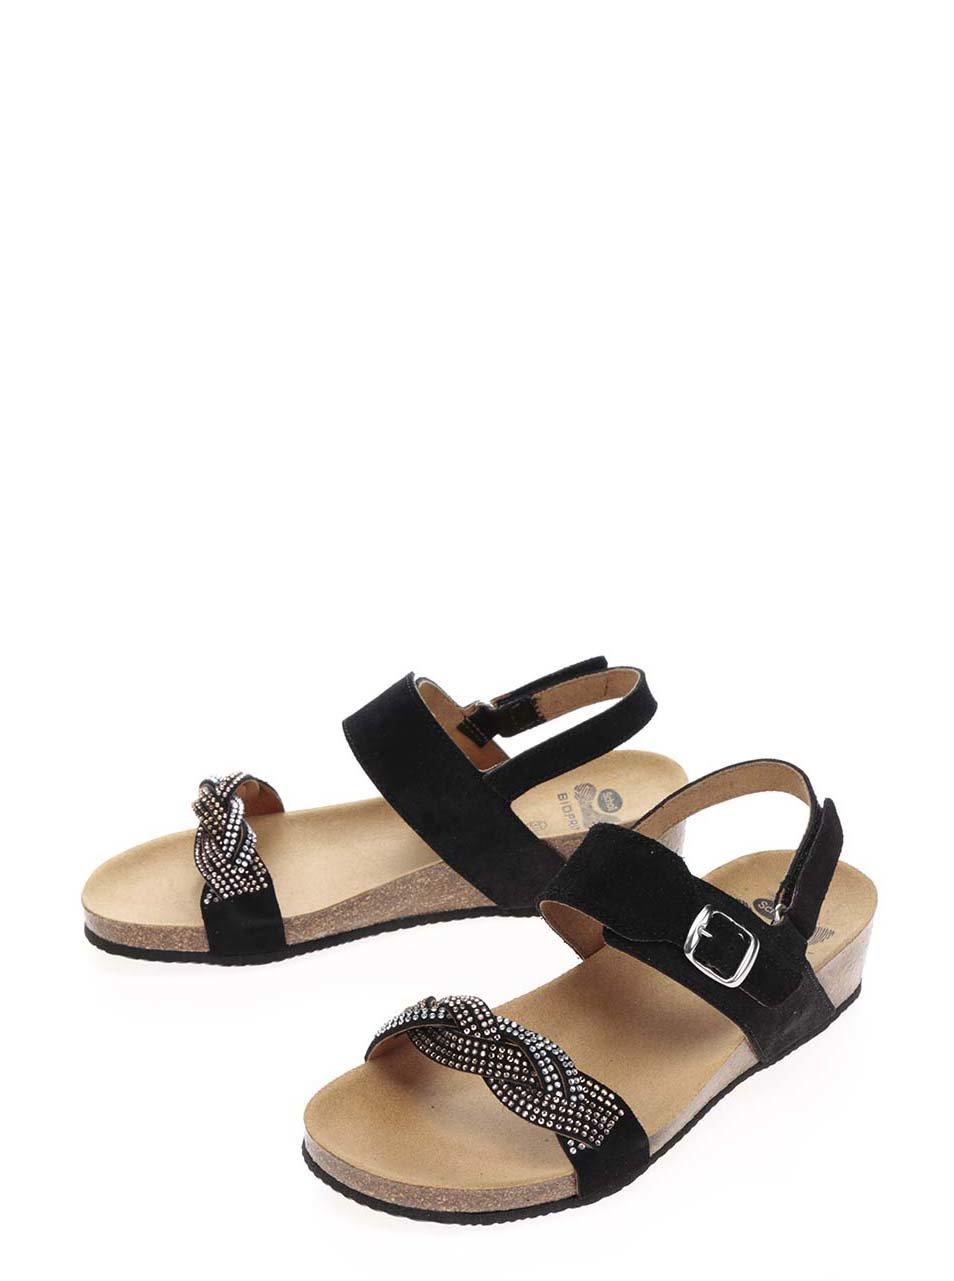 Čierne dámske semišové zdravotné sandále Scholl Evelyne ... d5e63793220